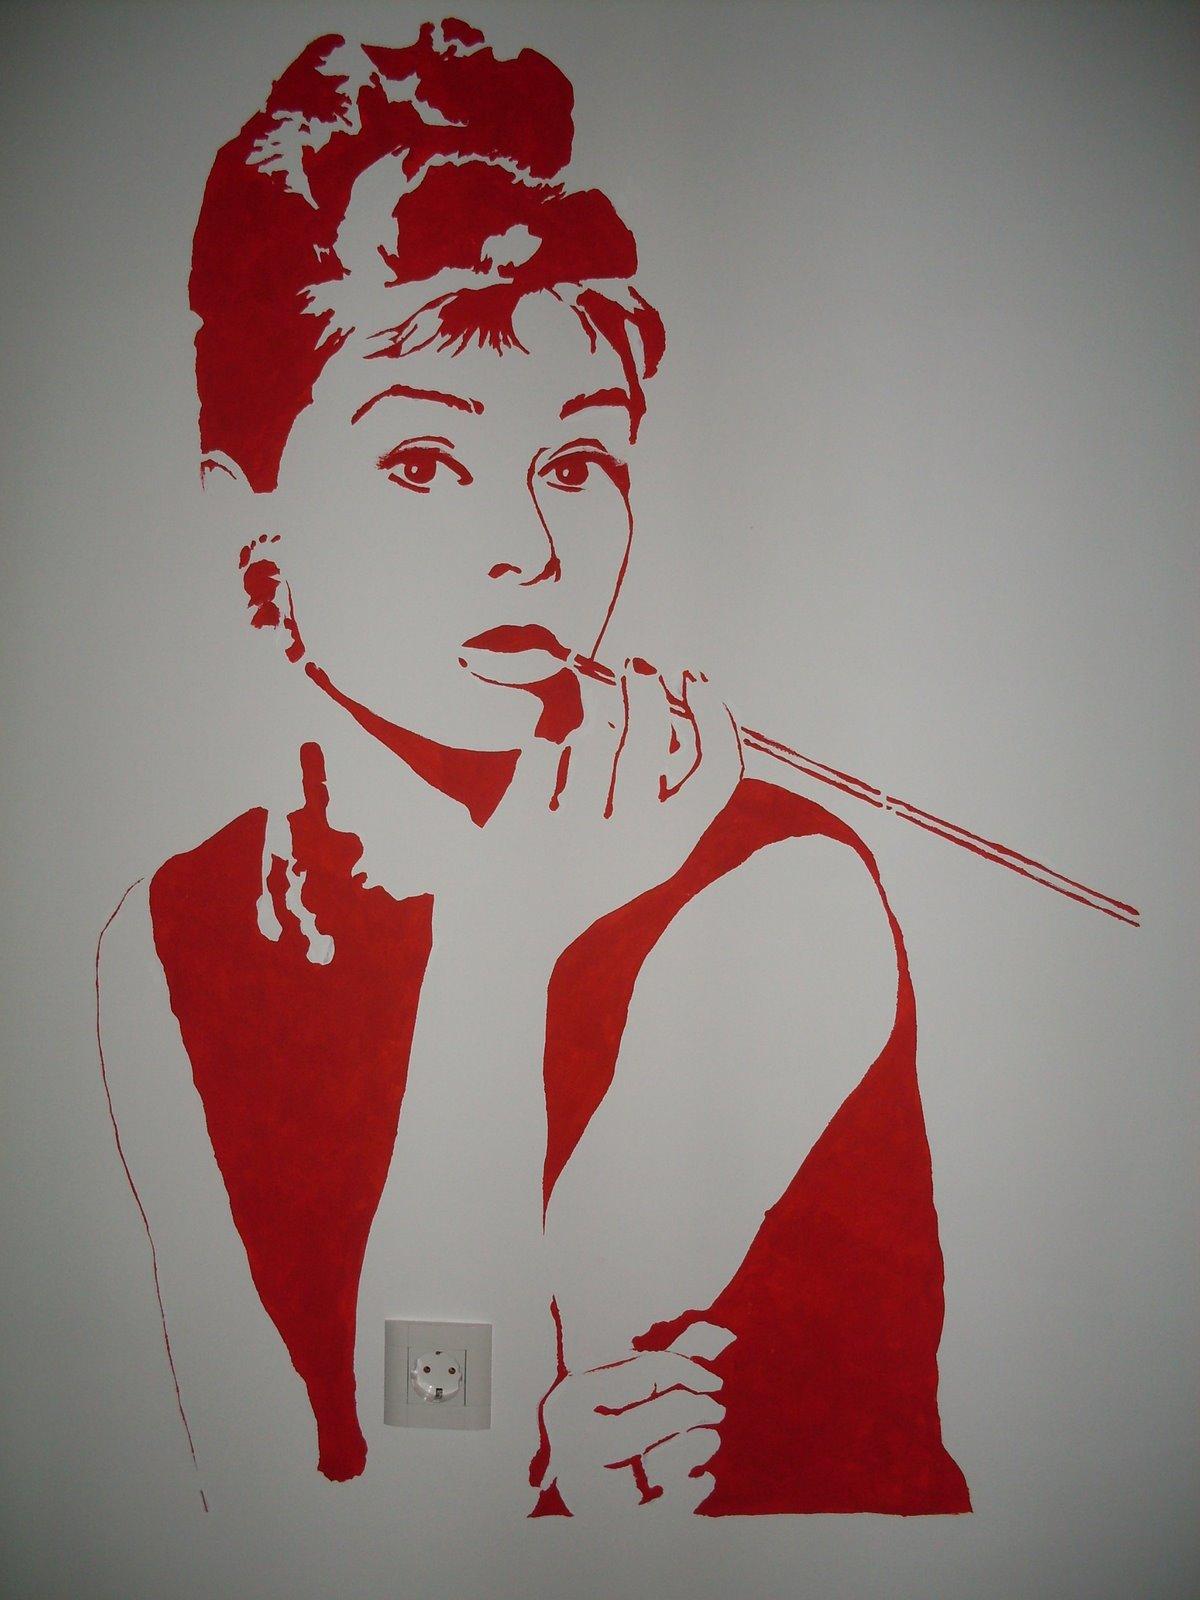 desene pe peretipaintings on the walls